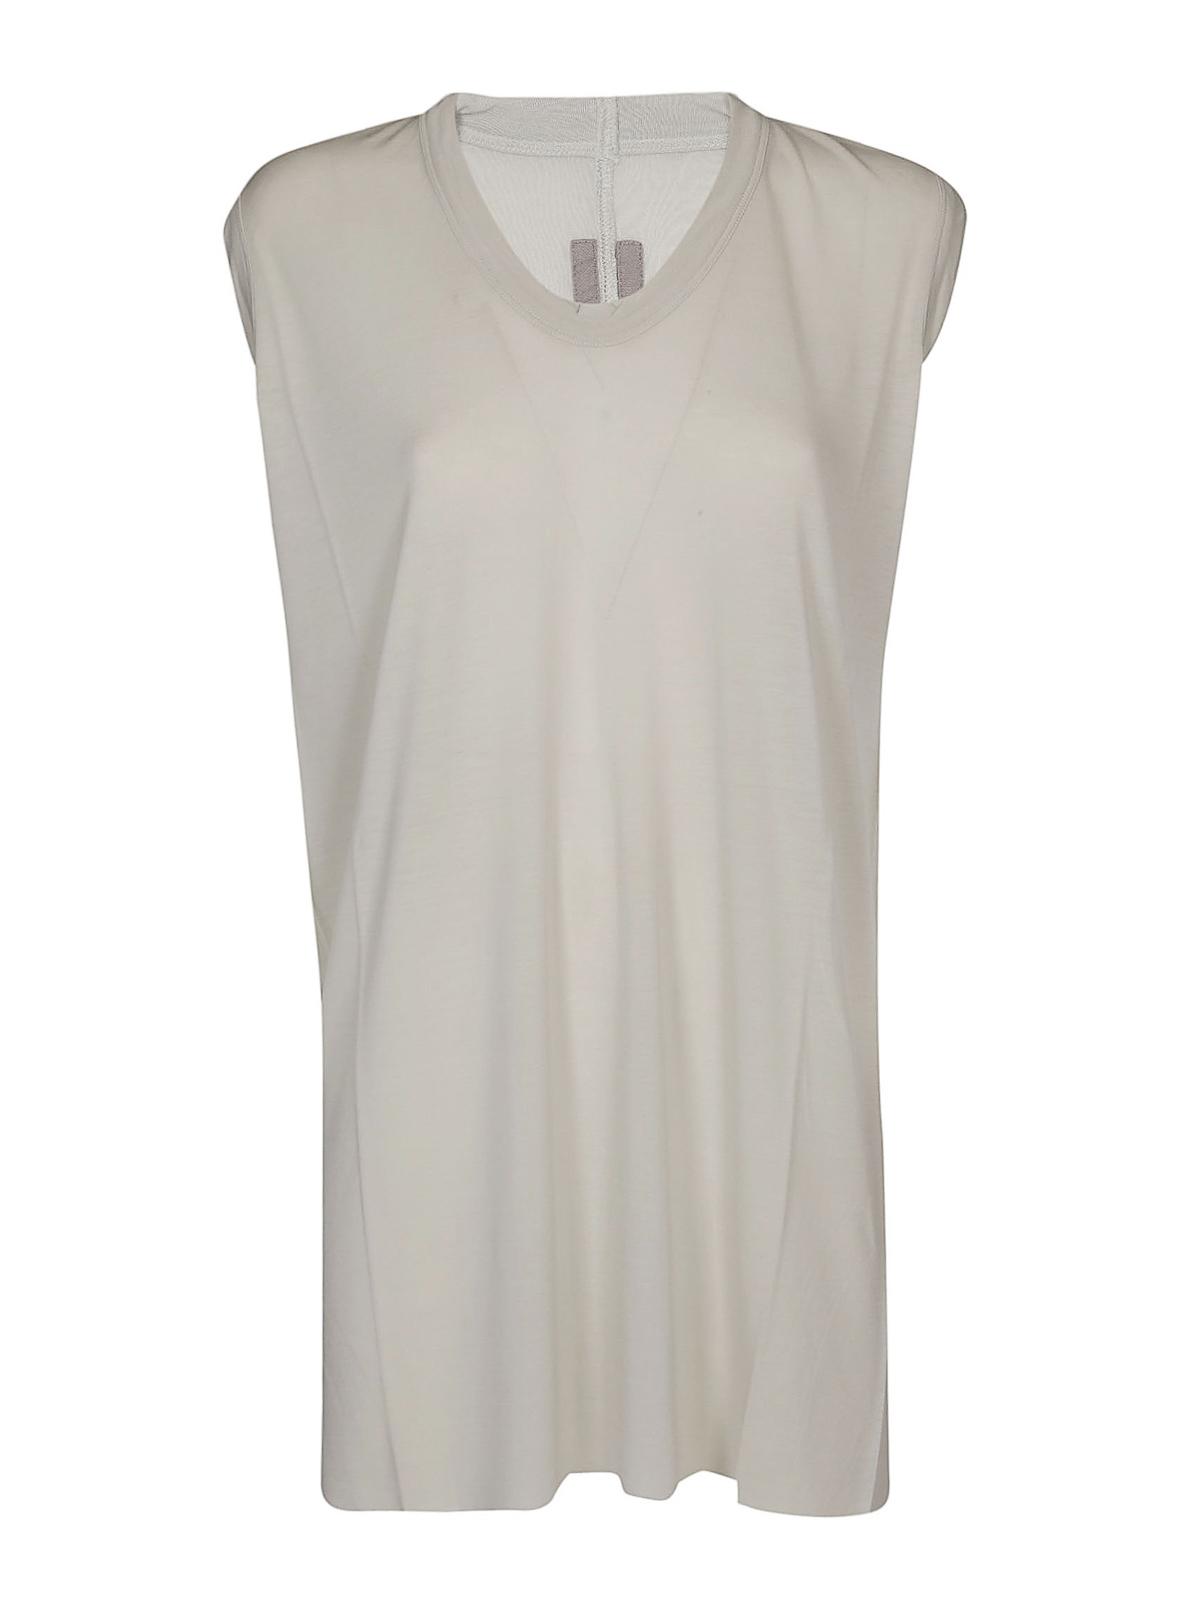 9bbbde8580 Rick Owens - V-neck white silk blend top - Tops & Tank tops ...